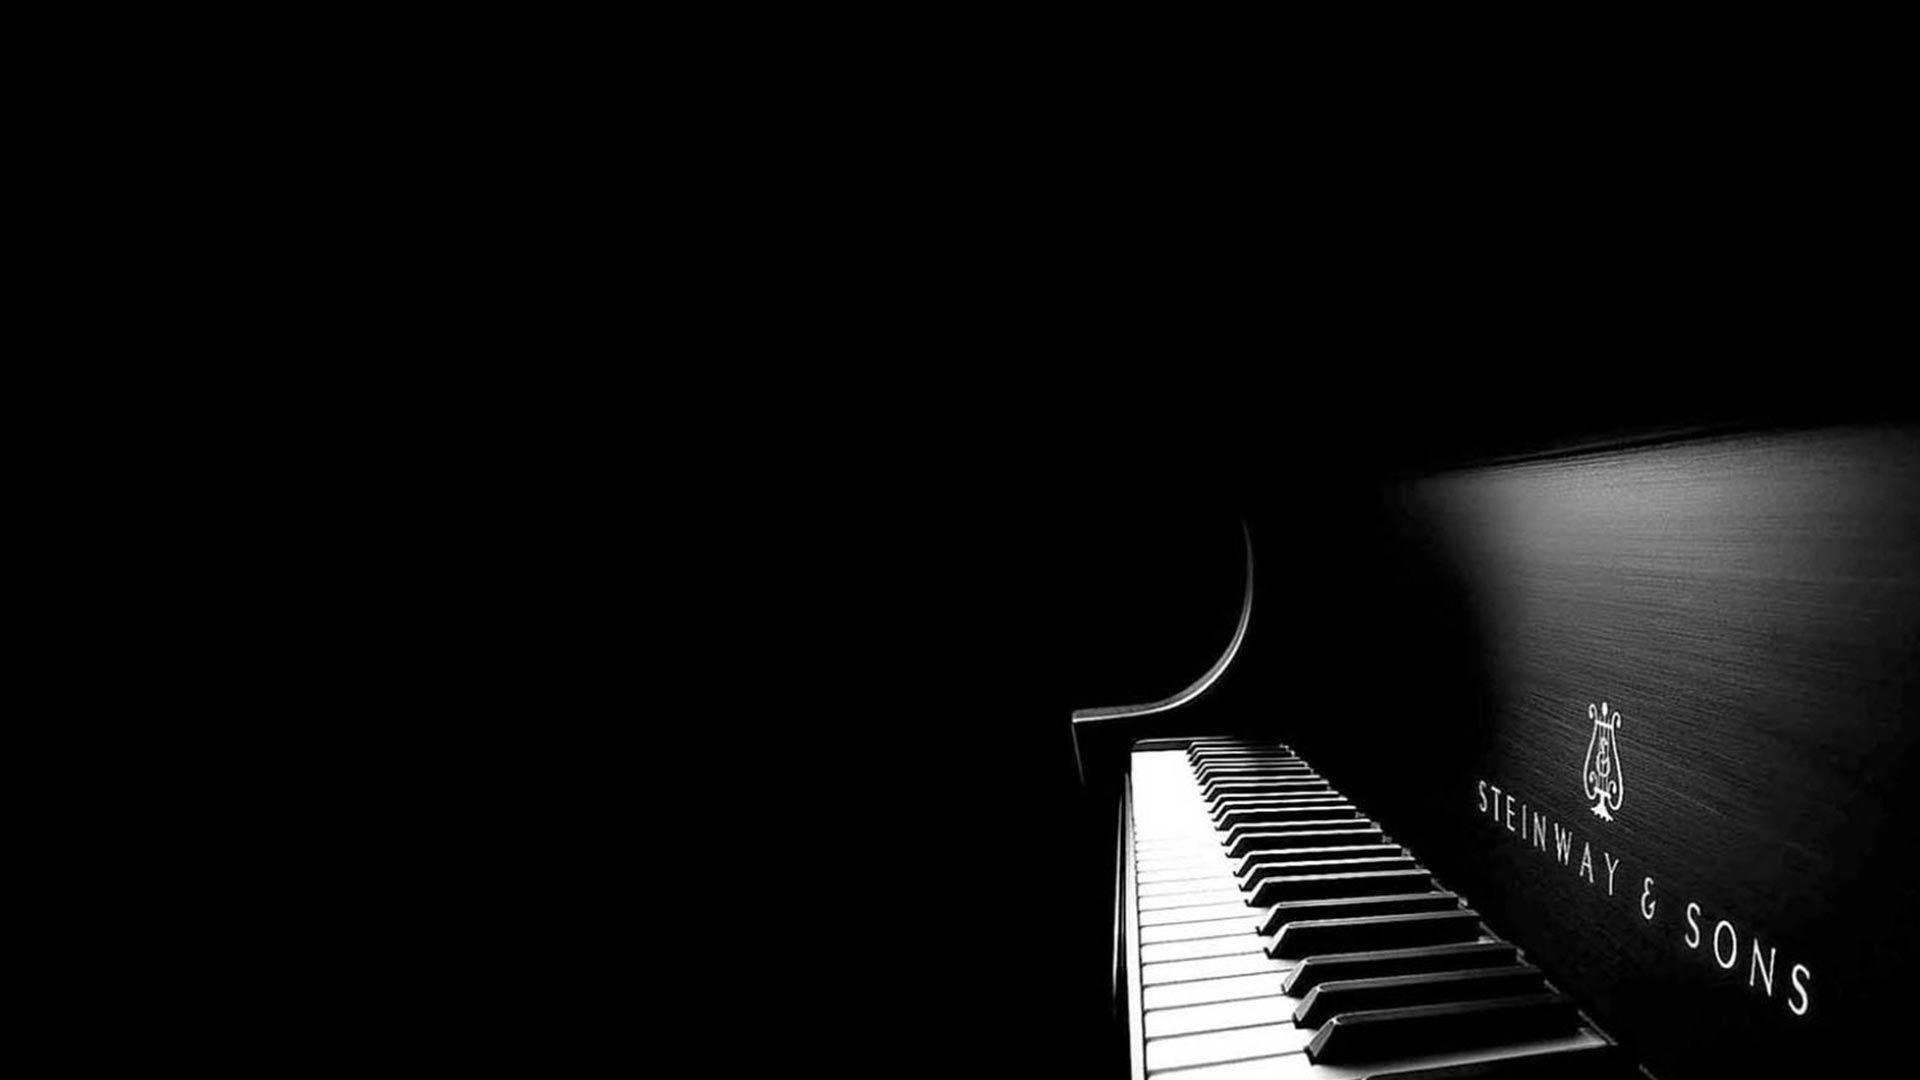 Steinway Sons Piano Music Wallpaper Music in 2019 Music 1920x1080